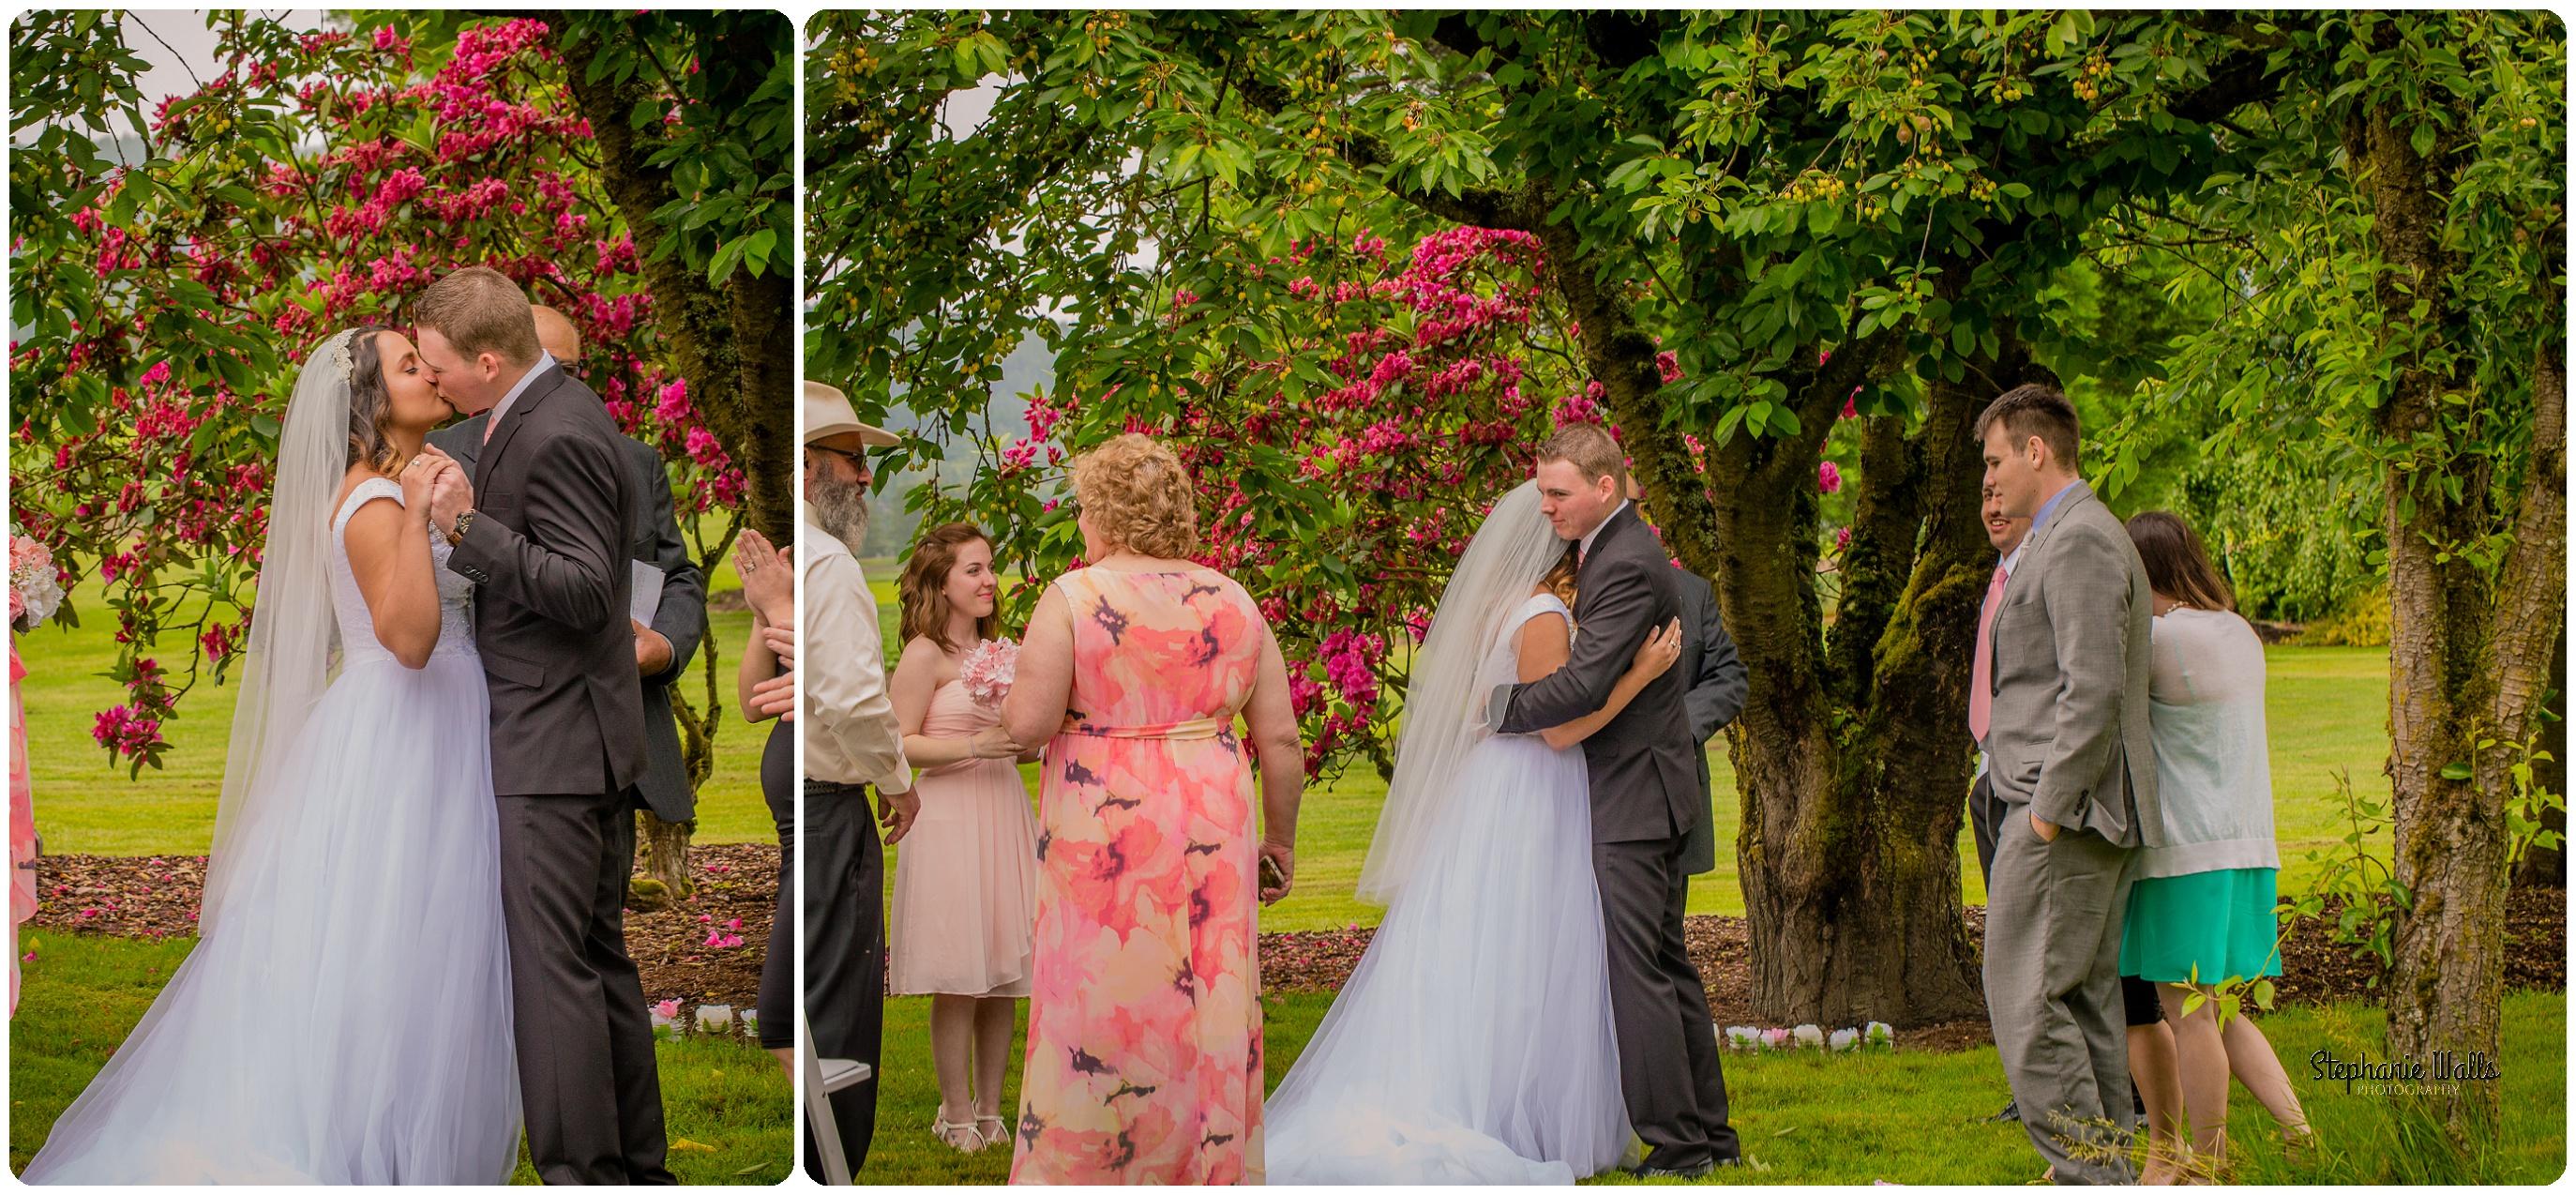 Miller Wedding151 WHERE EVER YOU GO | MAPLEHURST FARMS GUESTHOUSE | STEPHANIE WALLS PHOTOGRAPHY